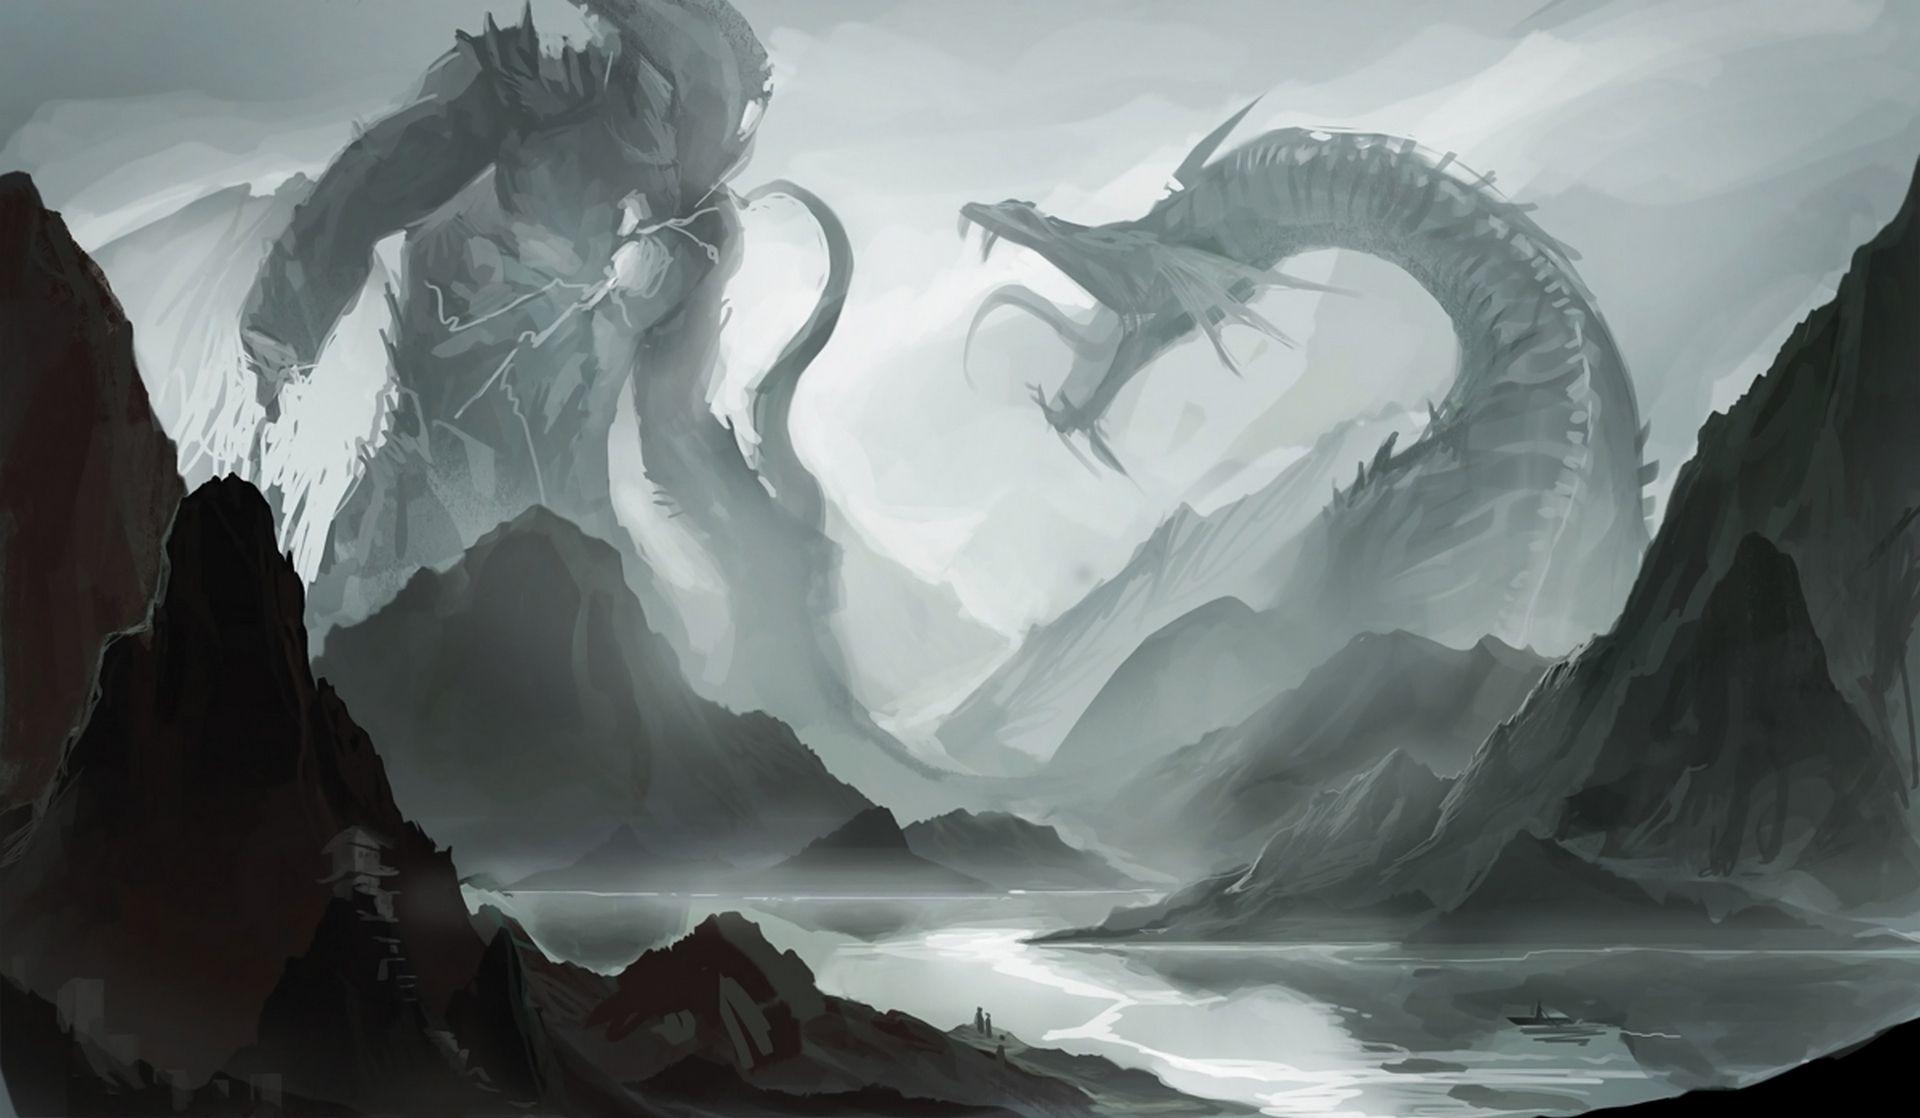 Fantasy Battle Wallpaper Fantasy Battle Fantasy Images Giant Monsters Fantasy giants wallpapers fantasy